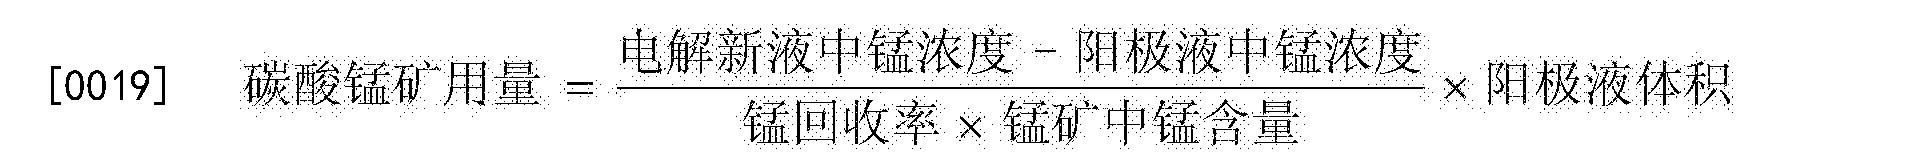 Figure CN107586951AD00061